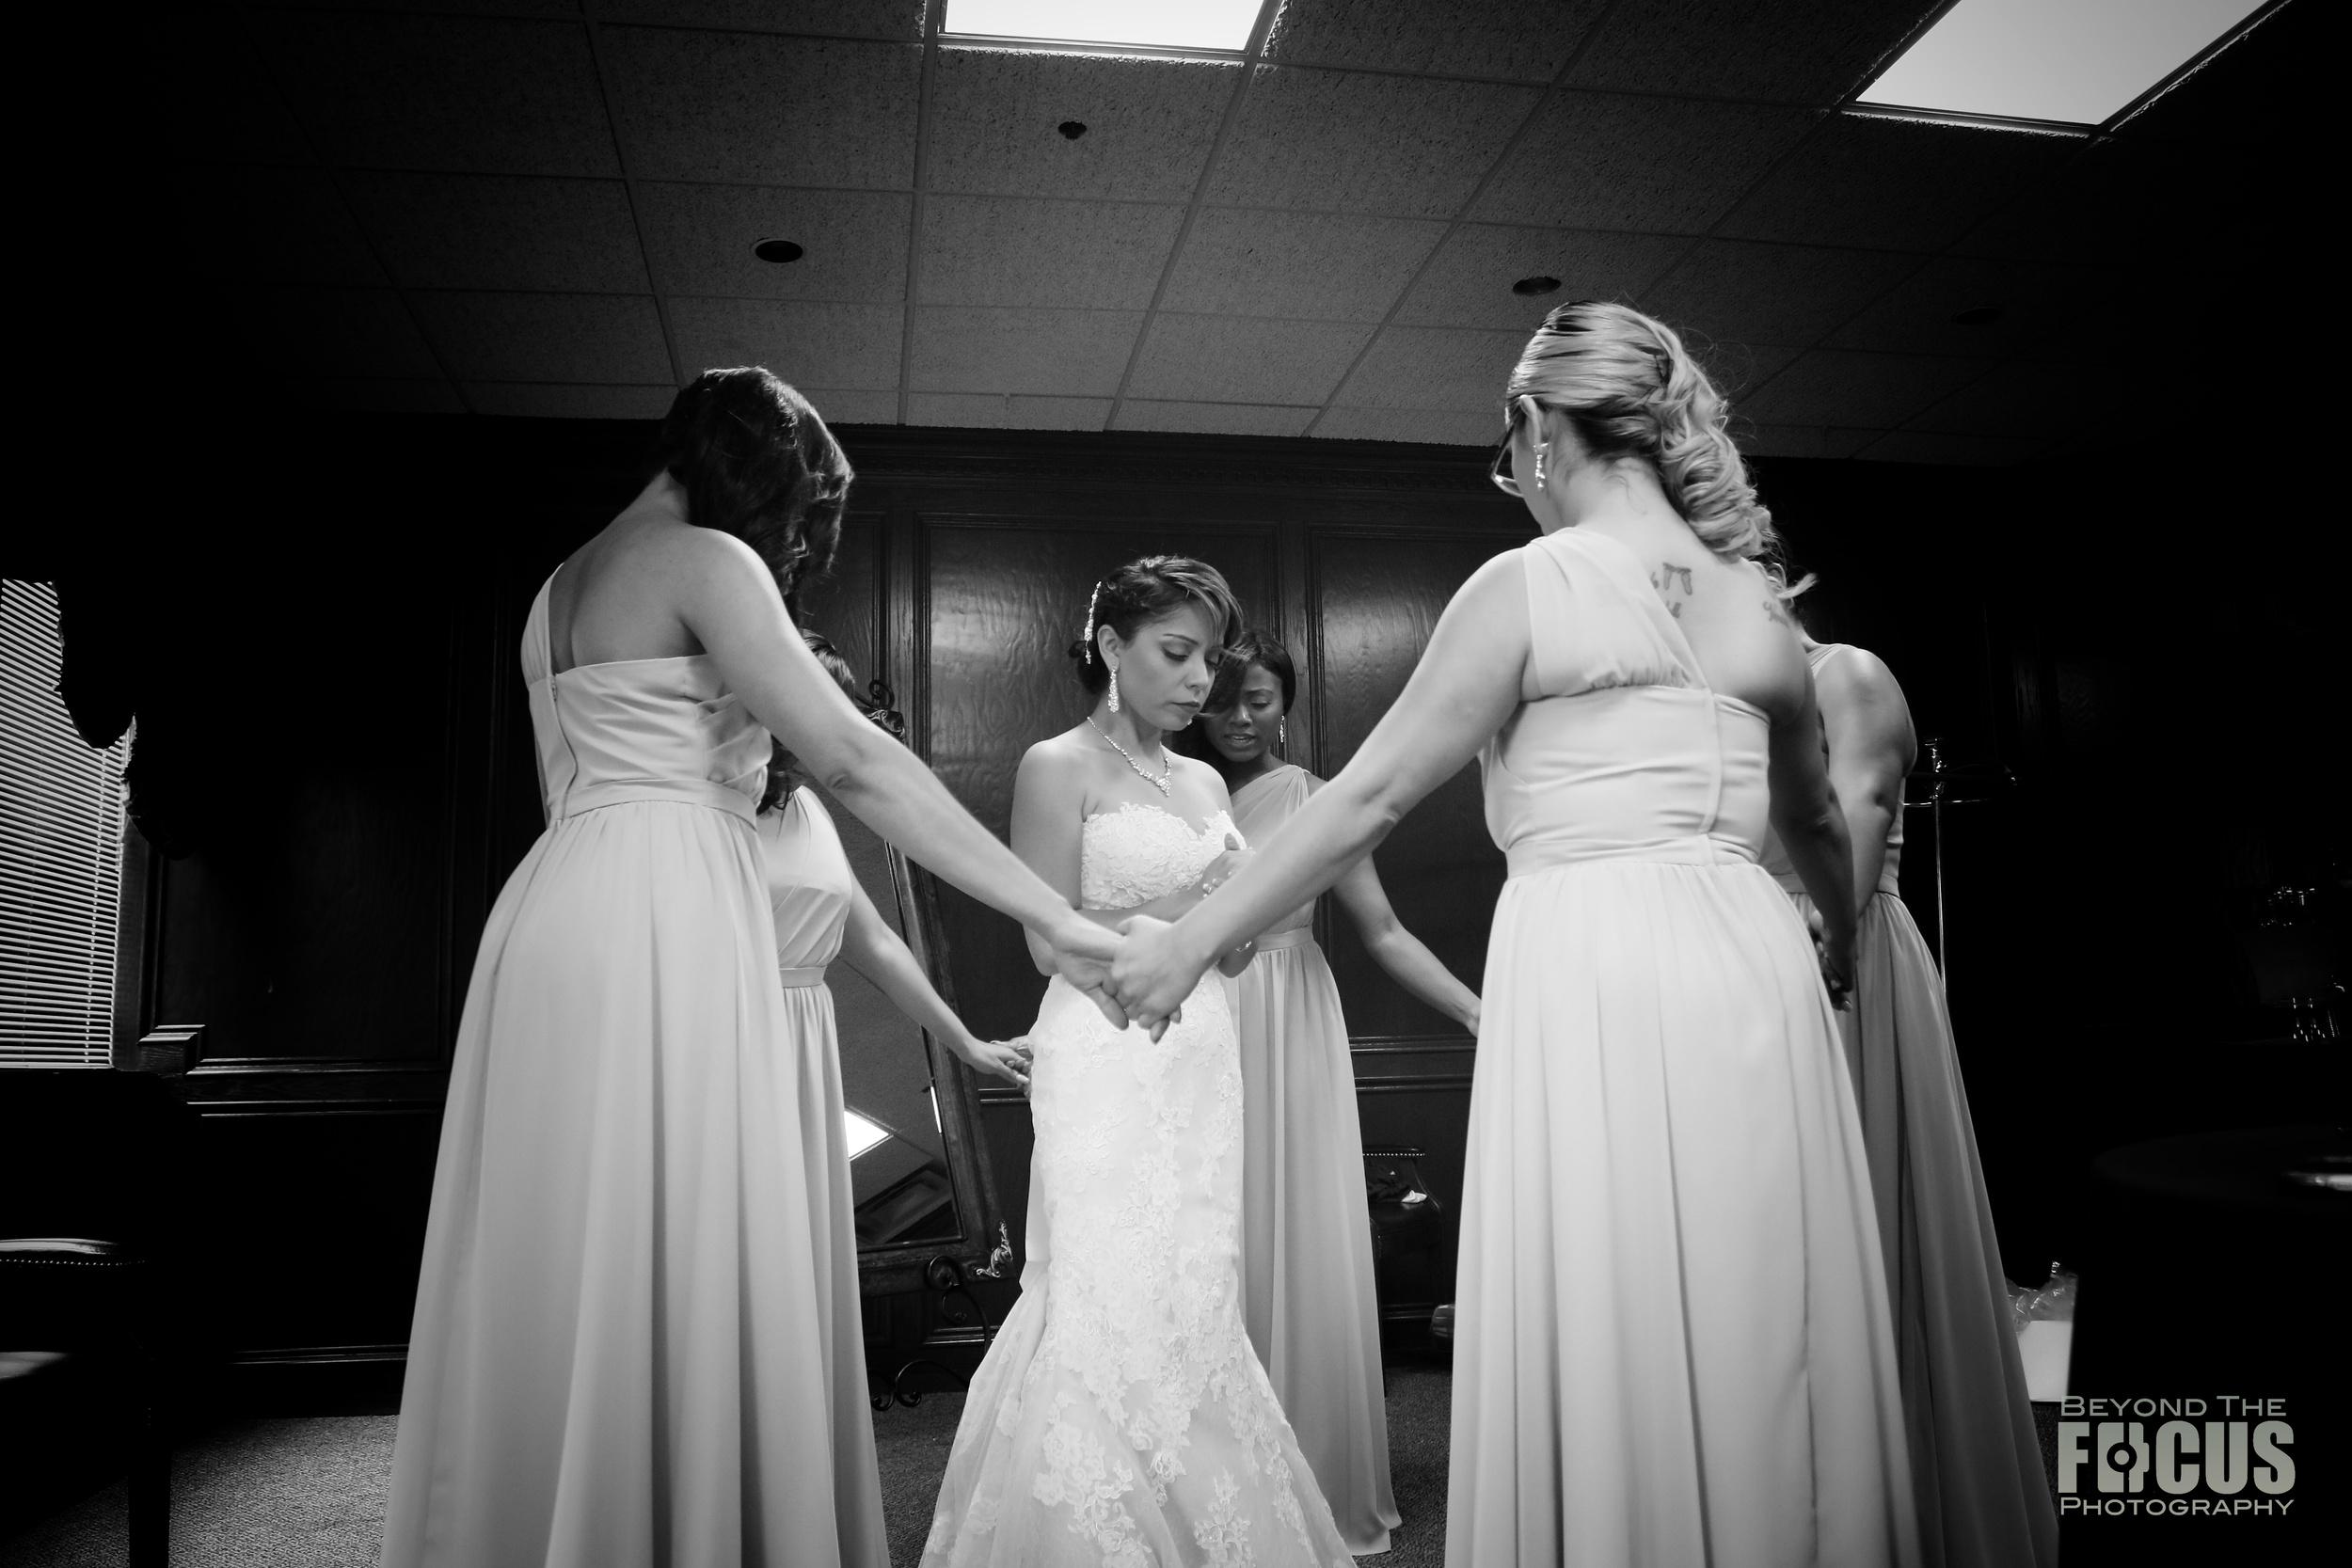 Palmer Wedding - Pre-Wedding Photos 24.jpg